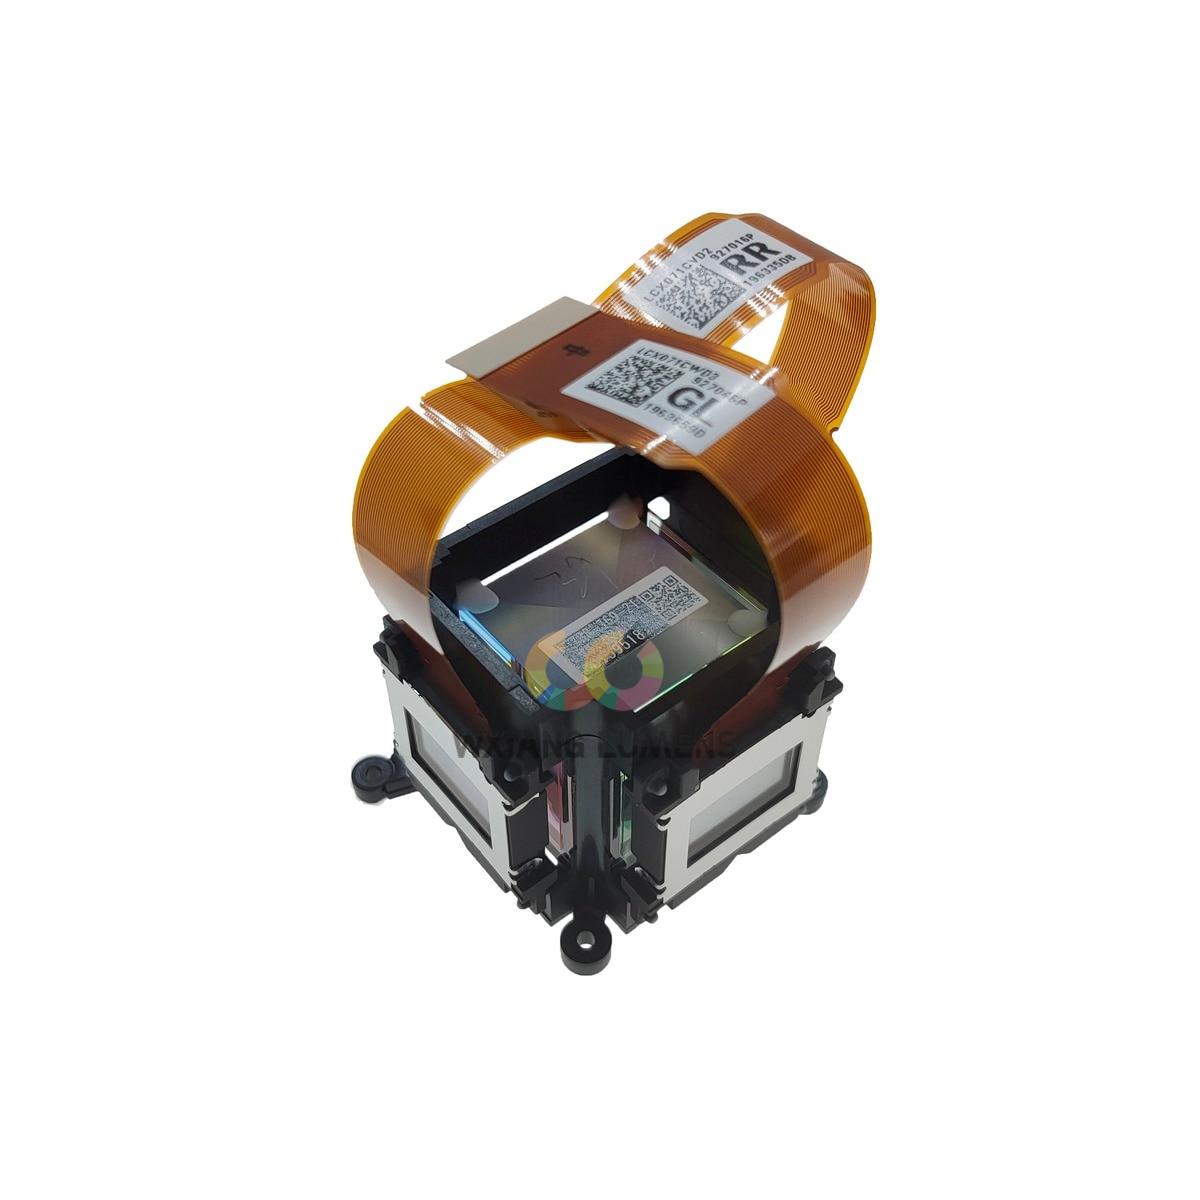 LCX071 LCX071C بروجيكتور LCD موشور آسى بالجملة كتلة وحدة بصرية SXRD 1080p الإسقاط الخلفي HDTV KDS نموذج